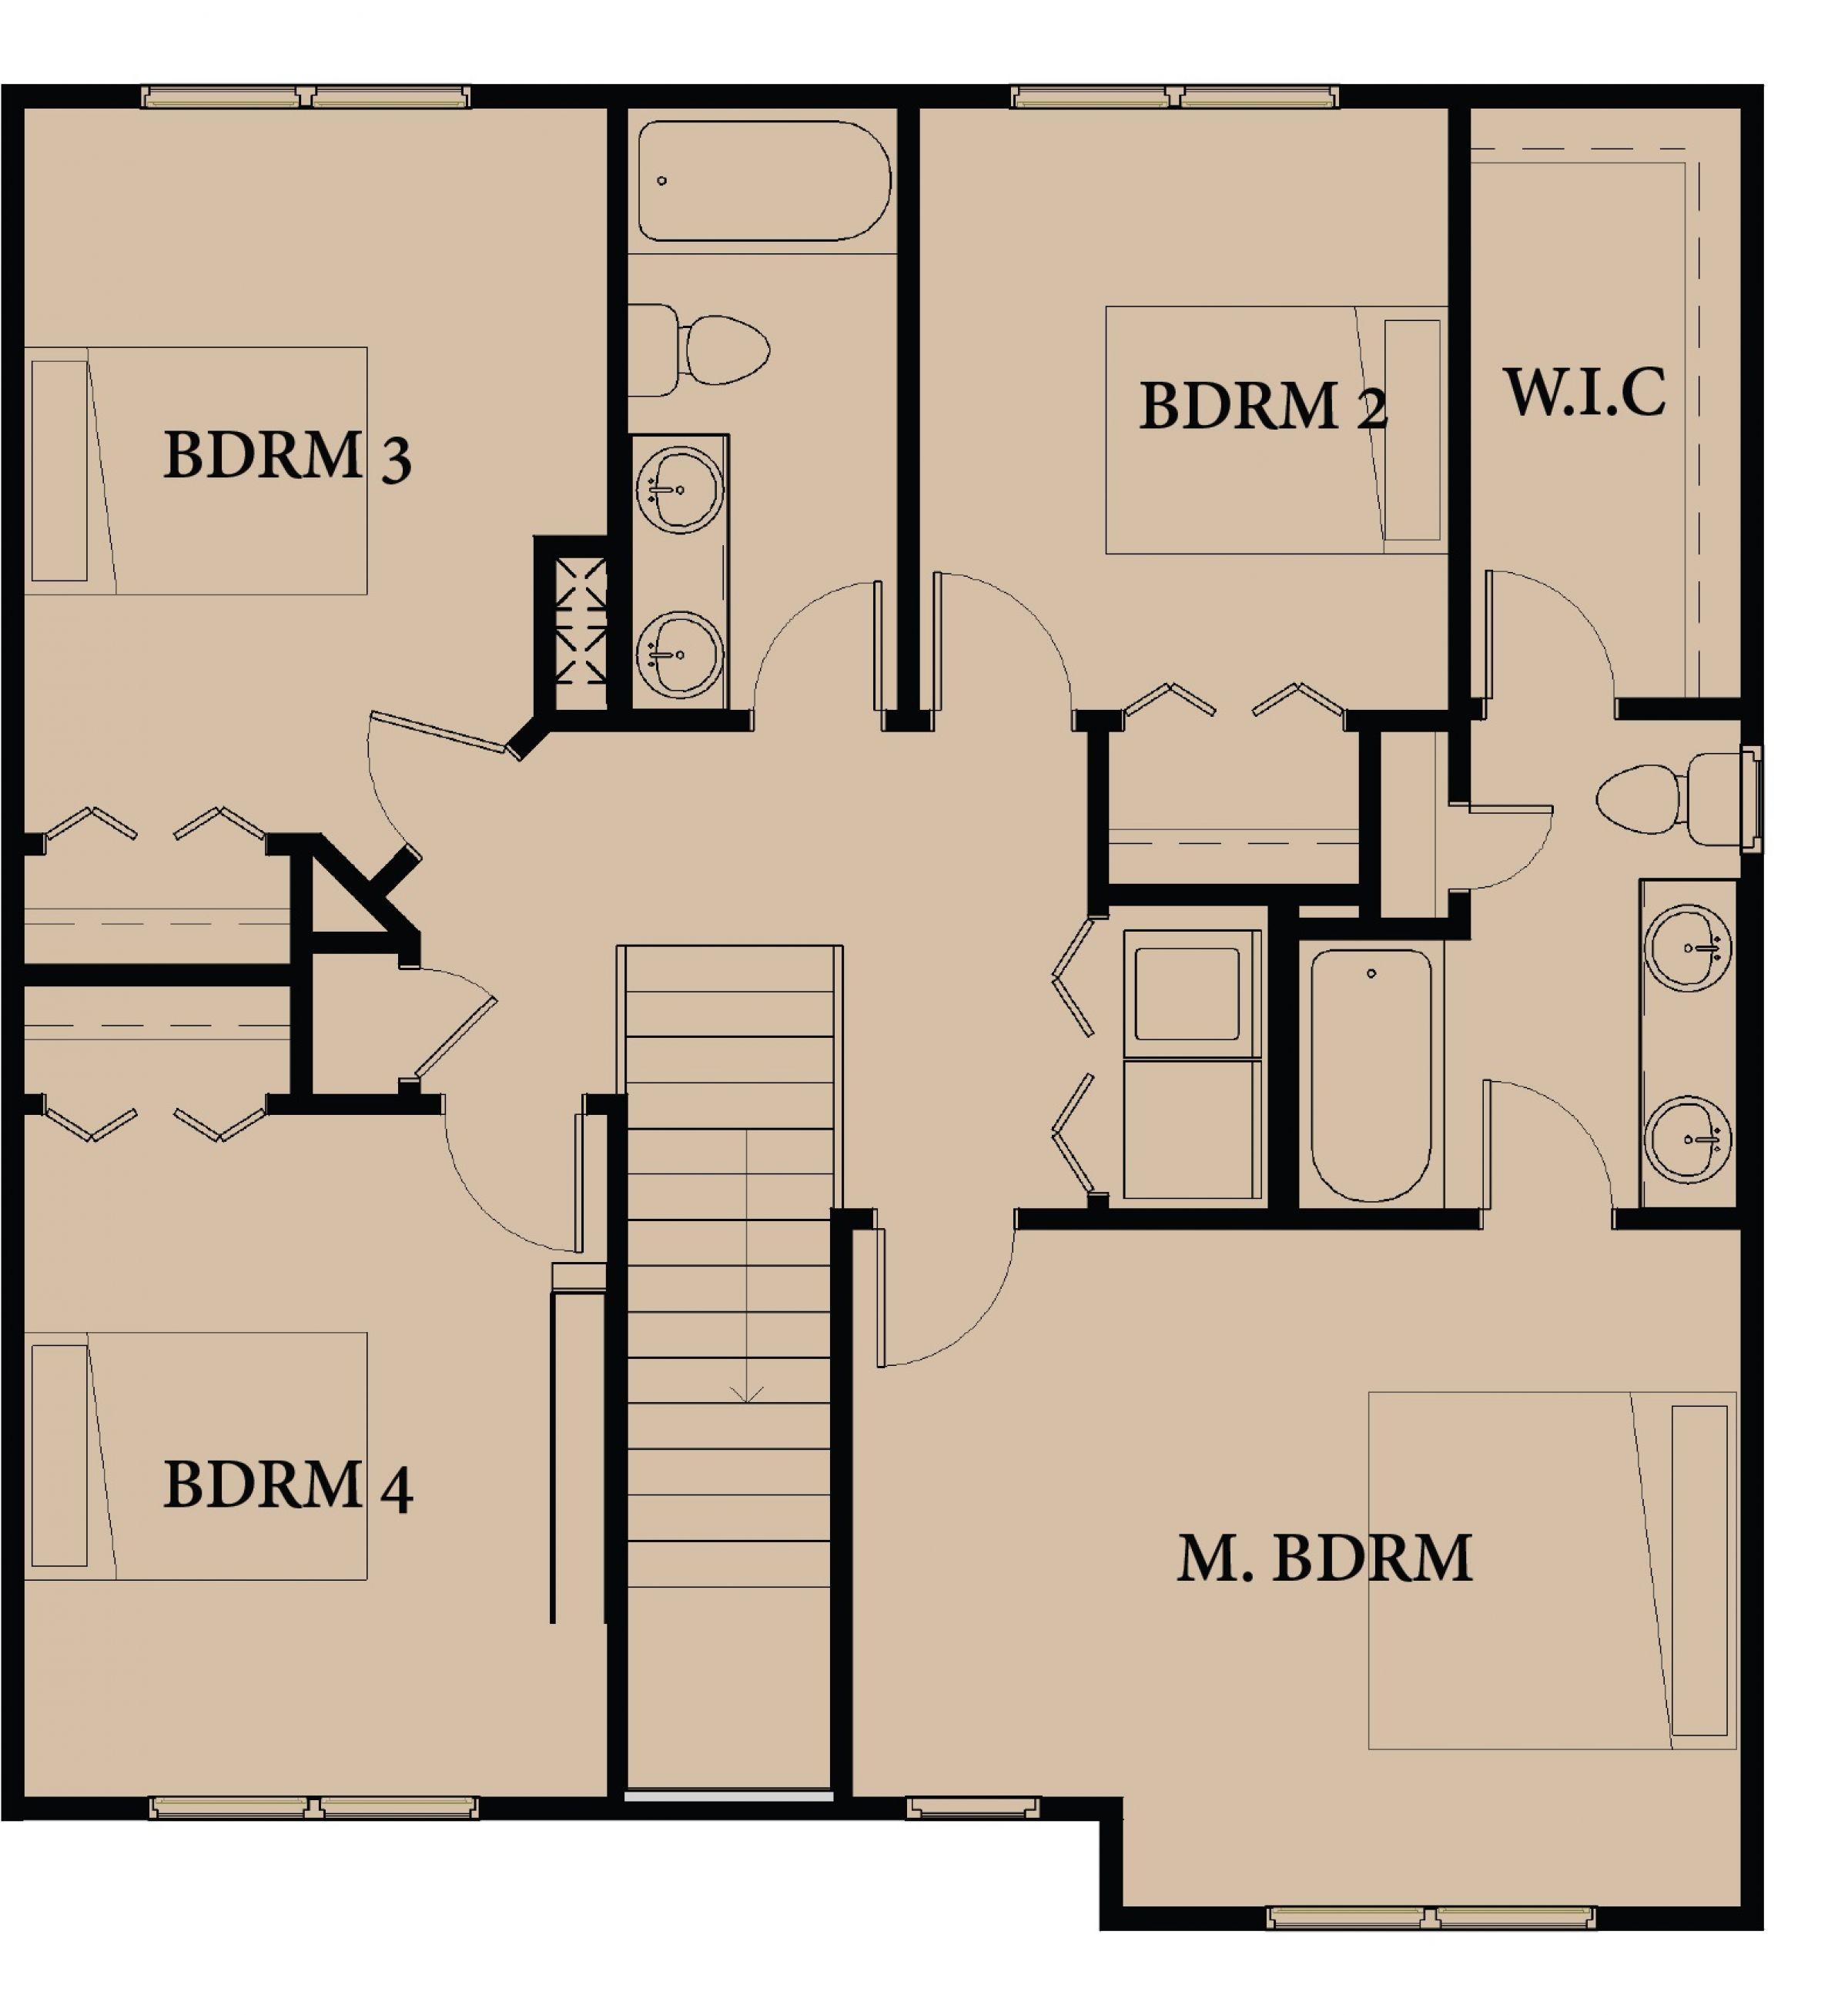 residential-jasper-county-iowa-0-acres-listing-number-15432-0-2021-03-26-211402.jpg